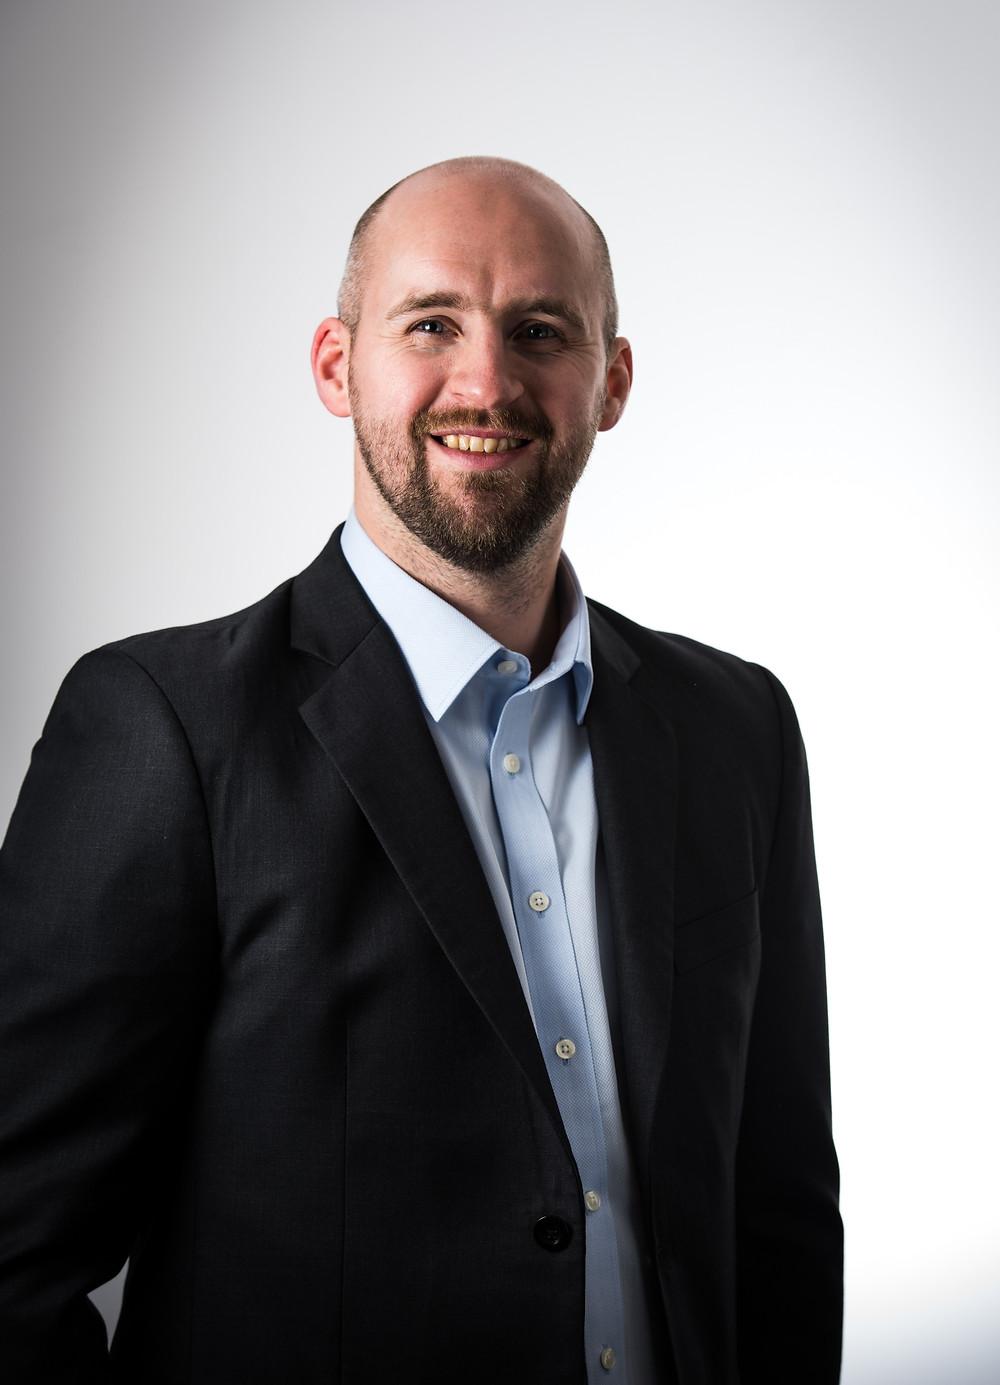 Stuart Lawson, Managing Director of AISUS Offshore